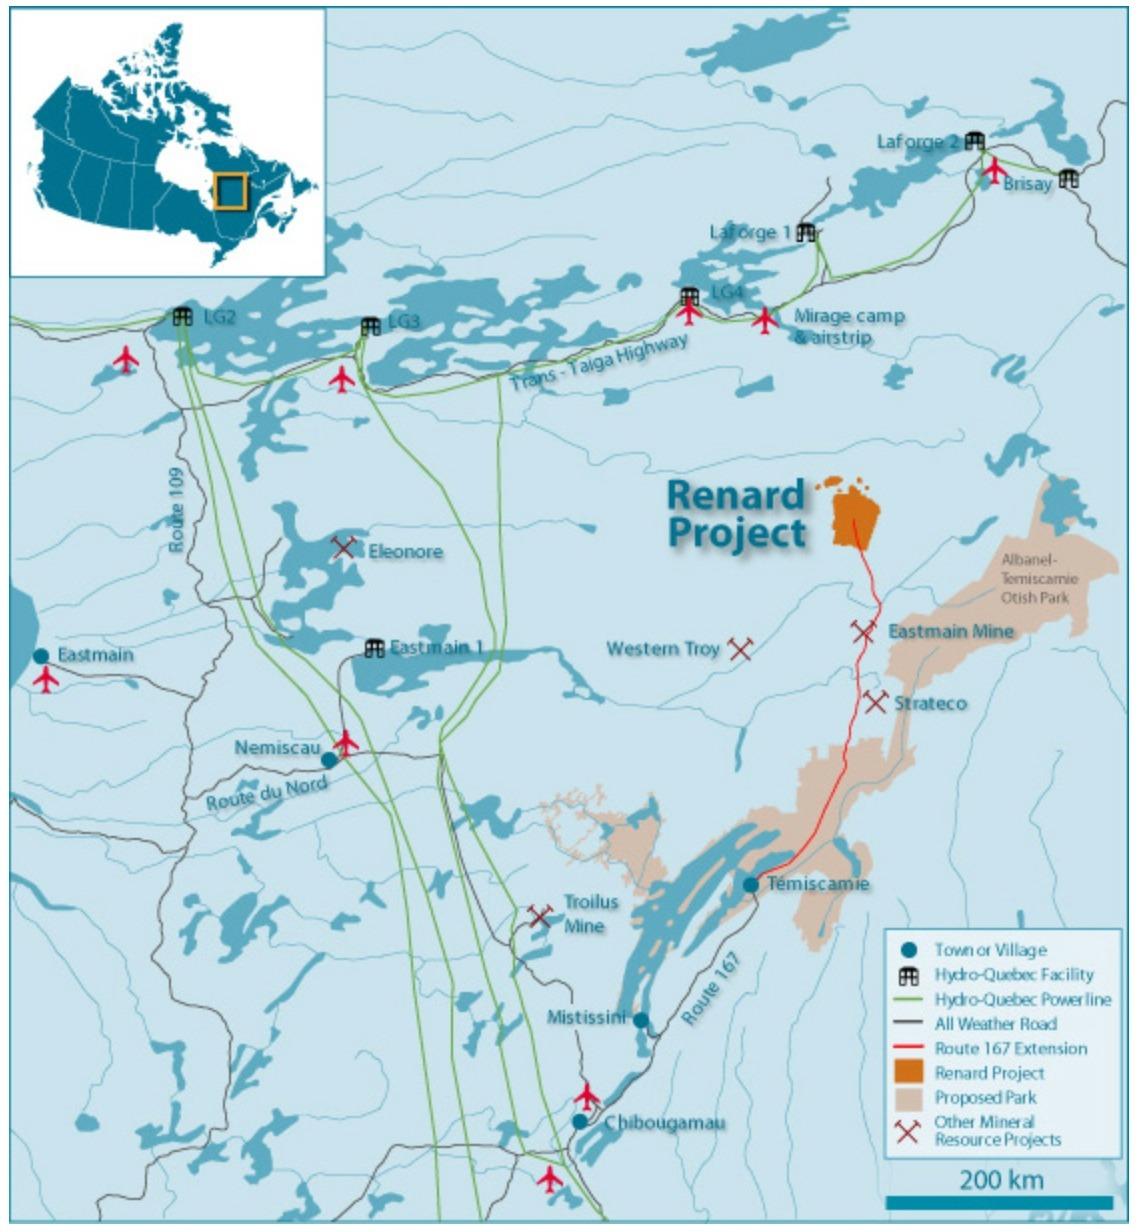 carte-du-projet-renard